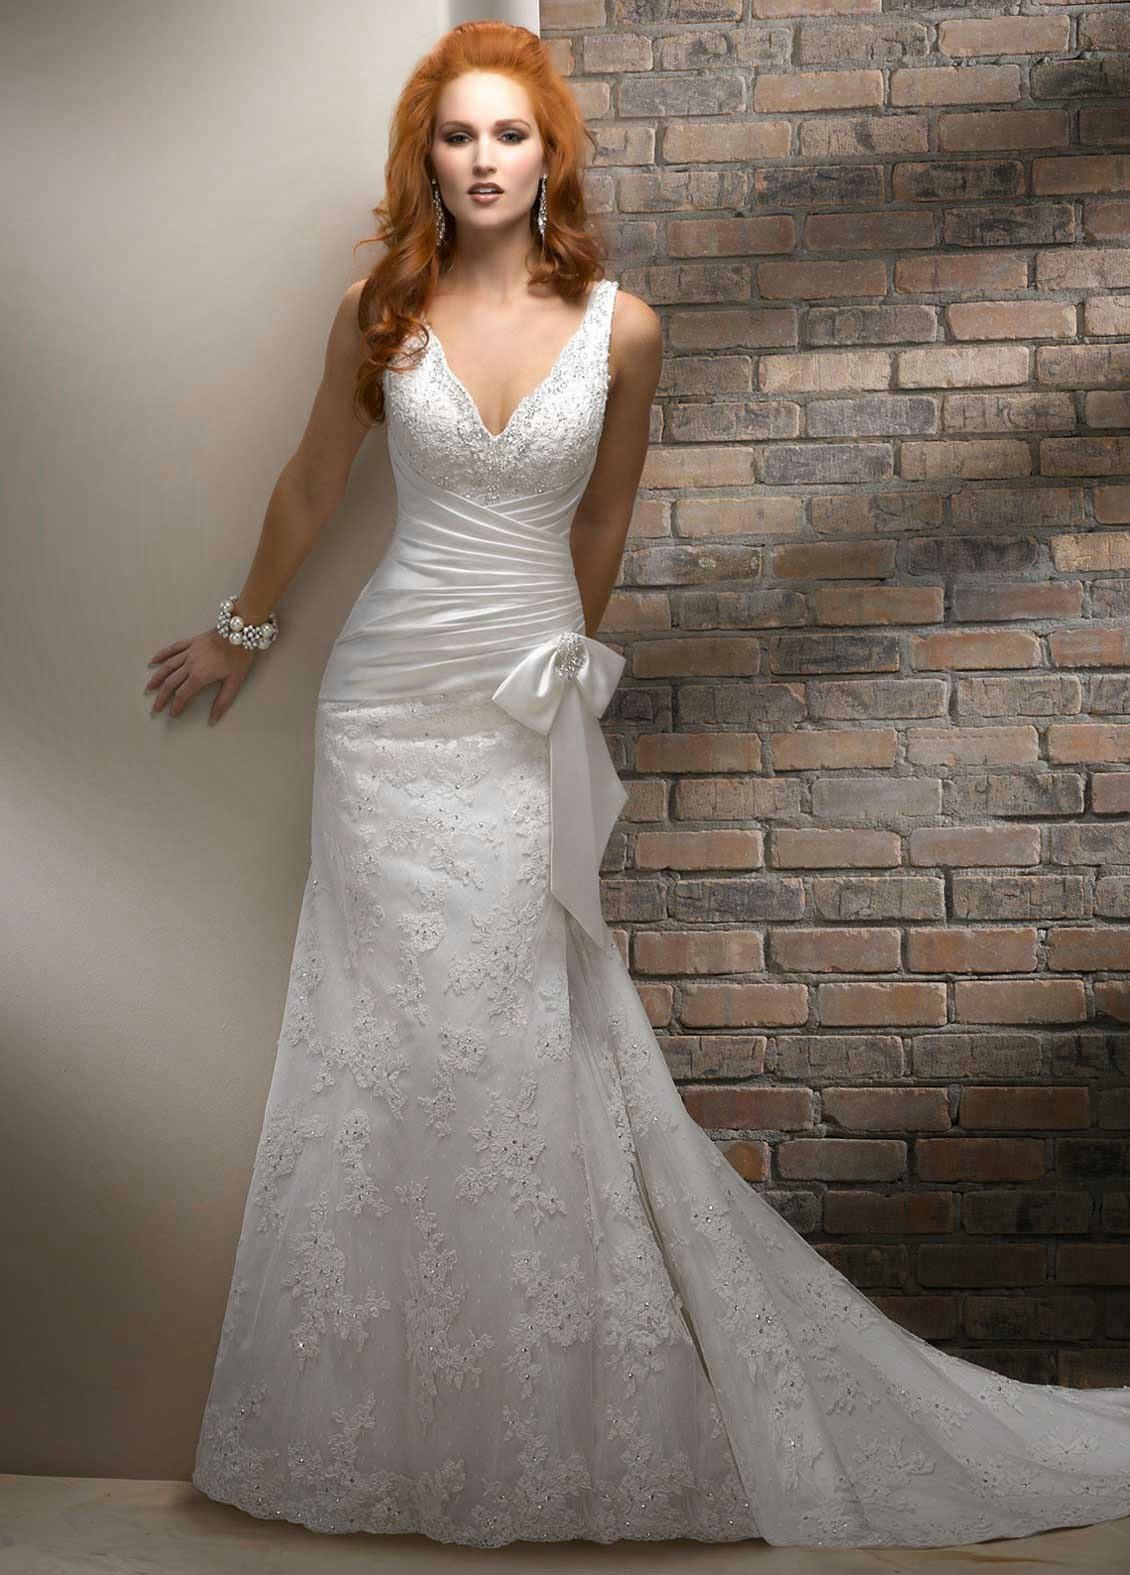 Strapless Mermaid Wedding Dresses Ideas Photos HD